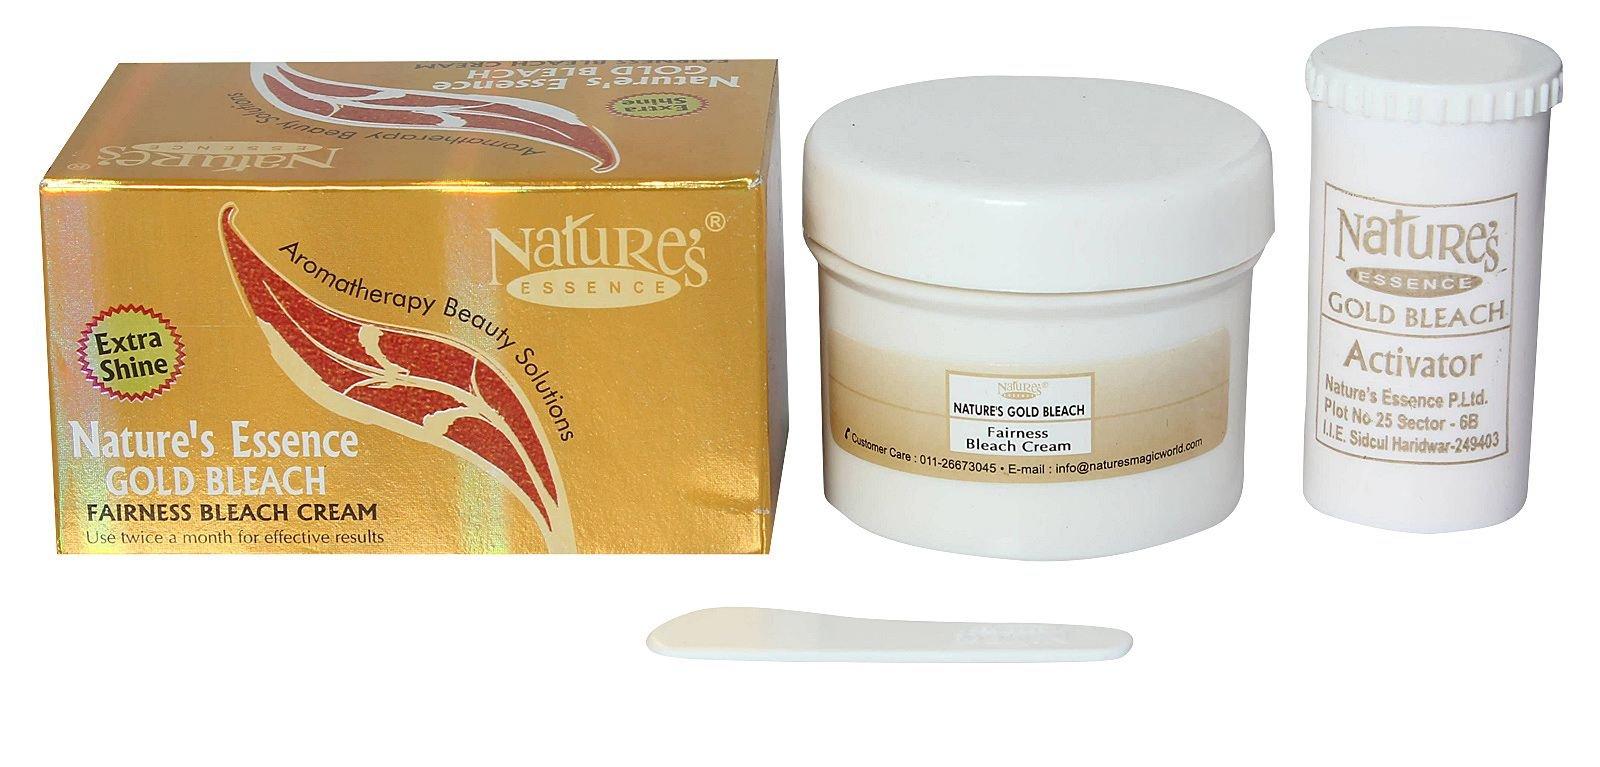 Nature's Essence Gold Bleach Fairness Cream, 500 gm product image